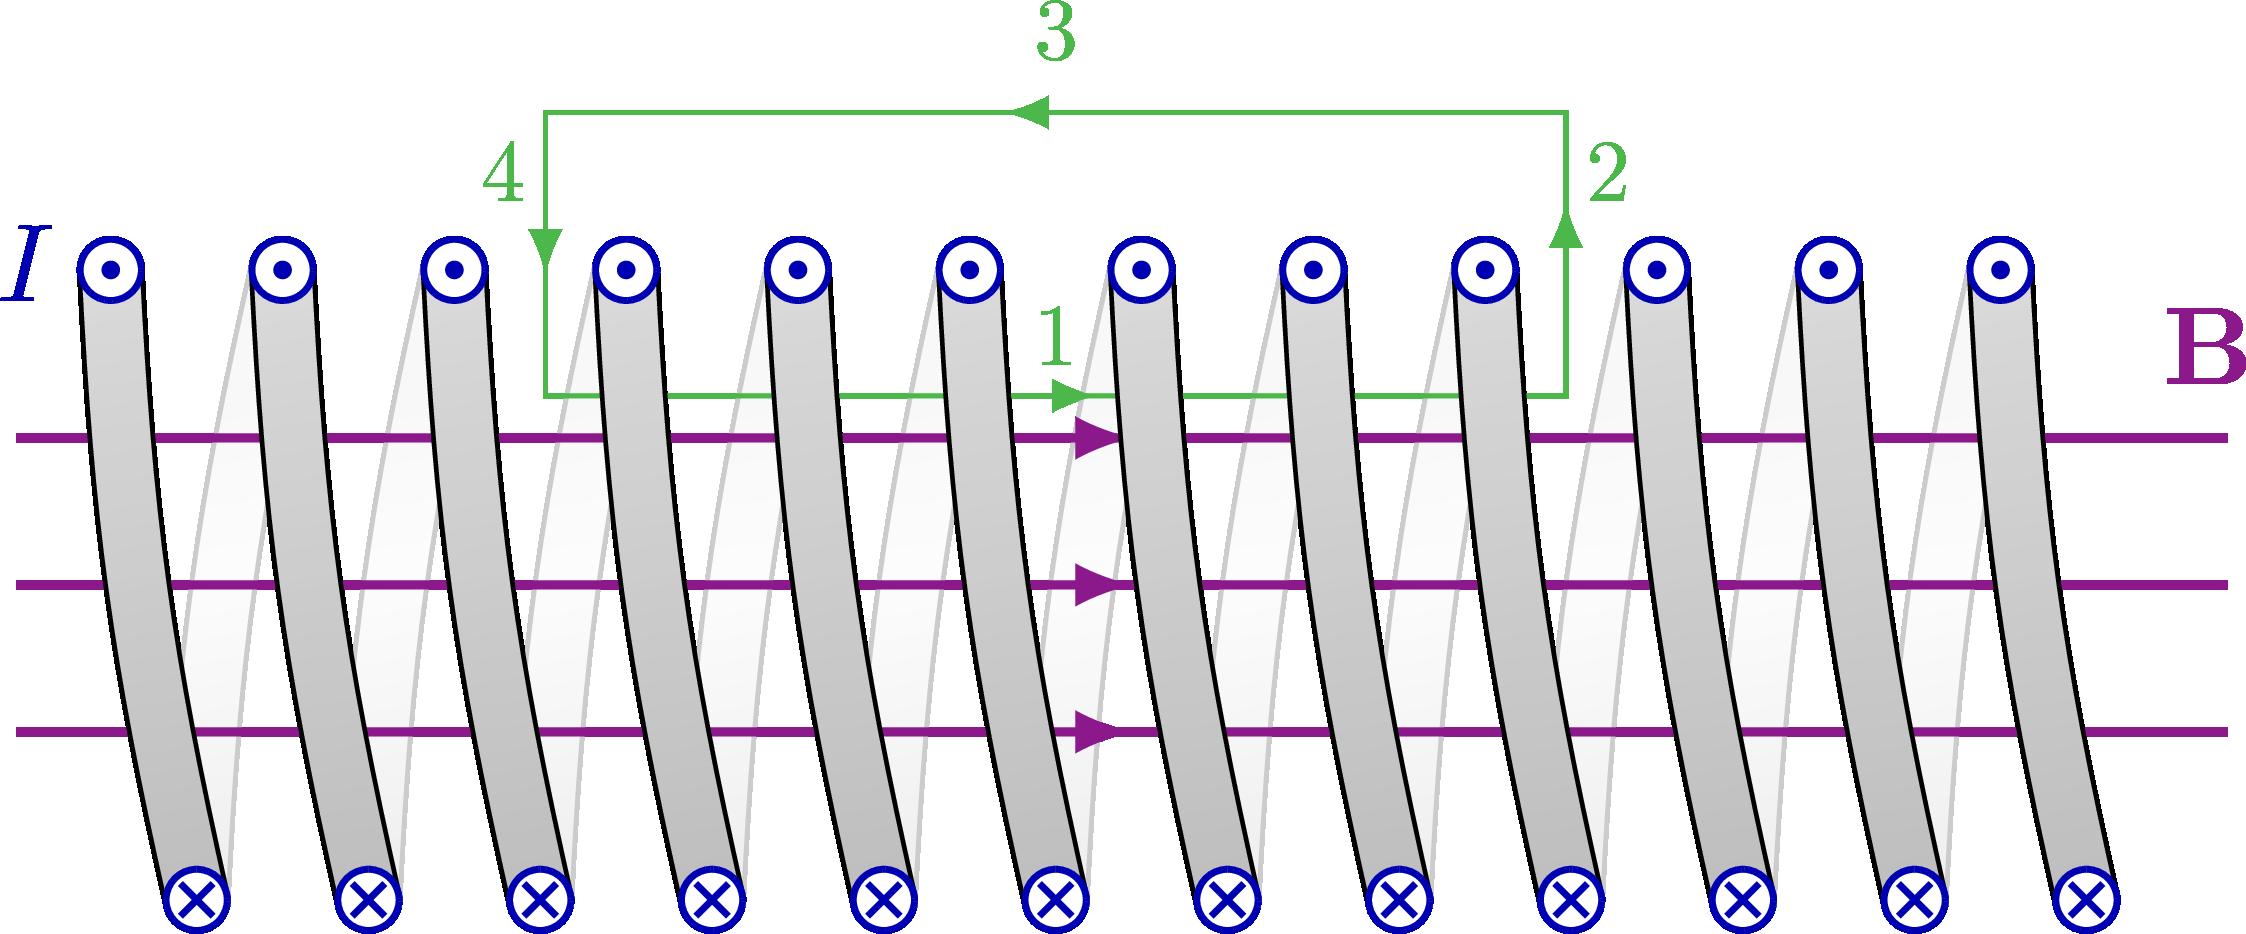 magnetic_field_solenoid-001.png